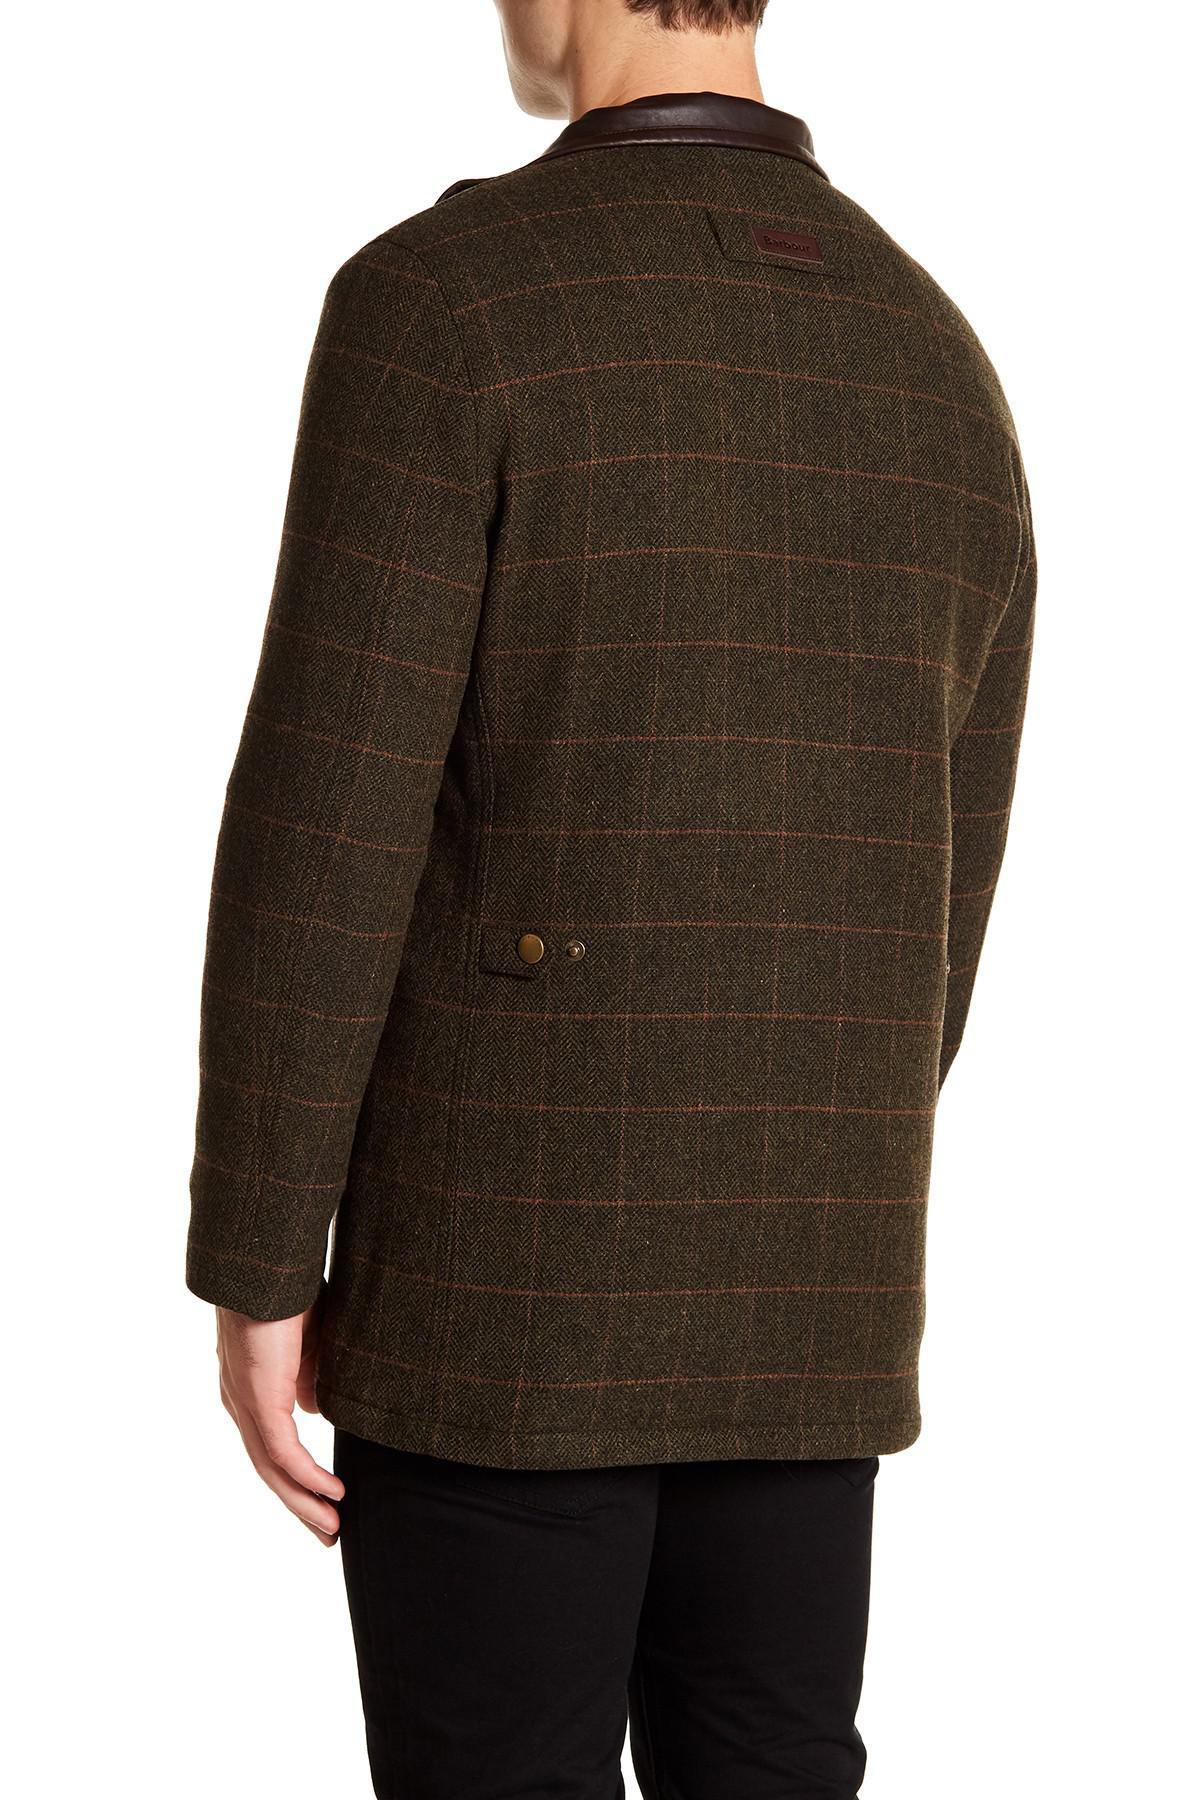 ca126b3fce2a Green Lyst Wool Barbour Jacket Tweed For Prest Men In gaYwgx